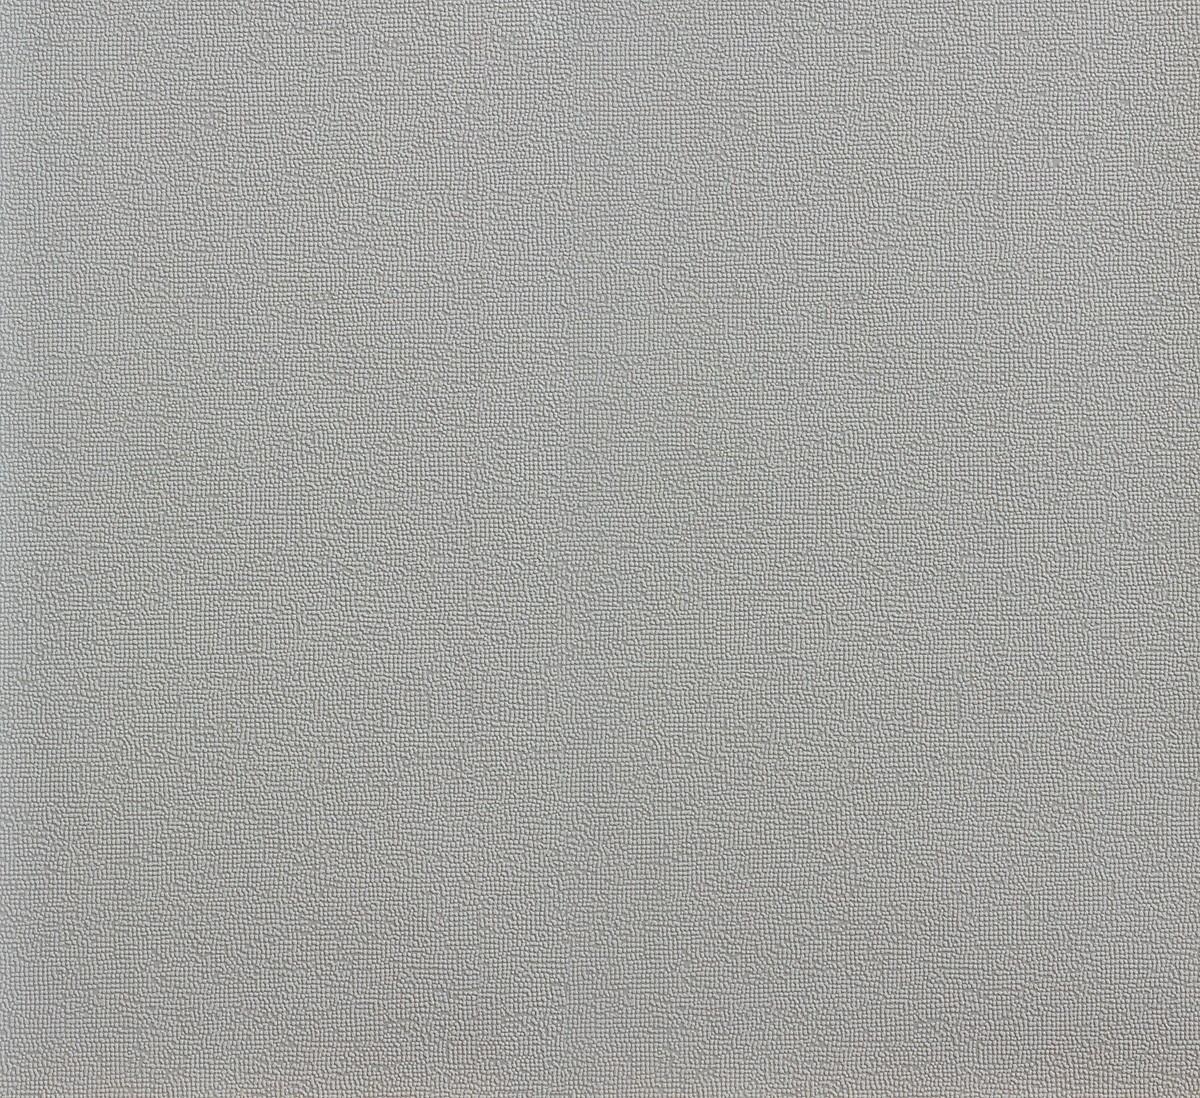 tapete vlies grau uni rasch let 39 s classic 859010 1 86. Black Bedroom Furniture Sets. Home Design Ideas